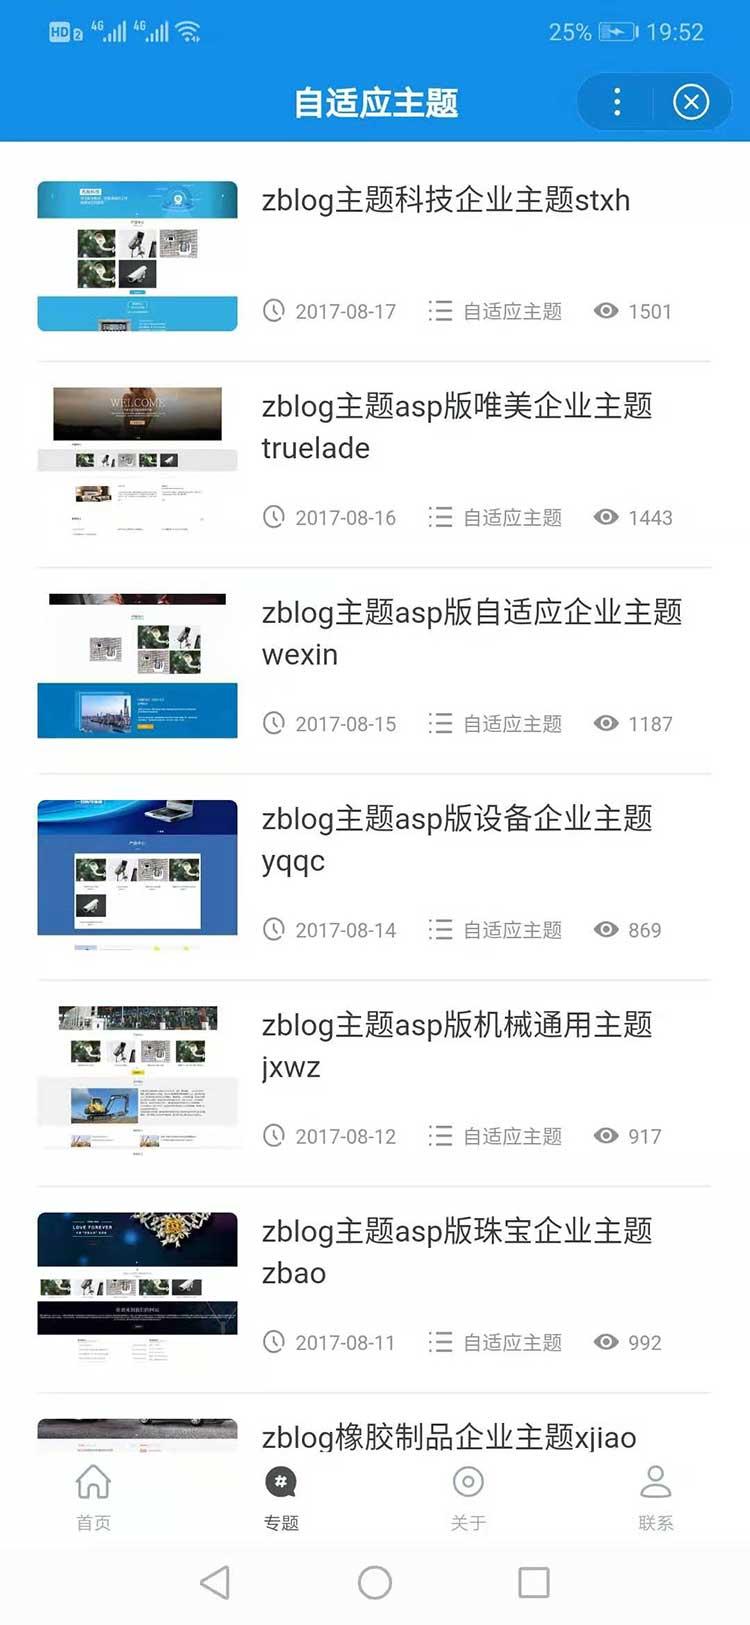 zblog小程序专题页